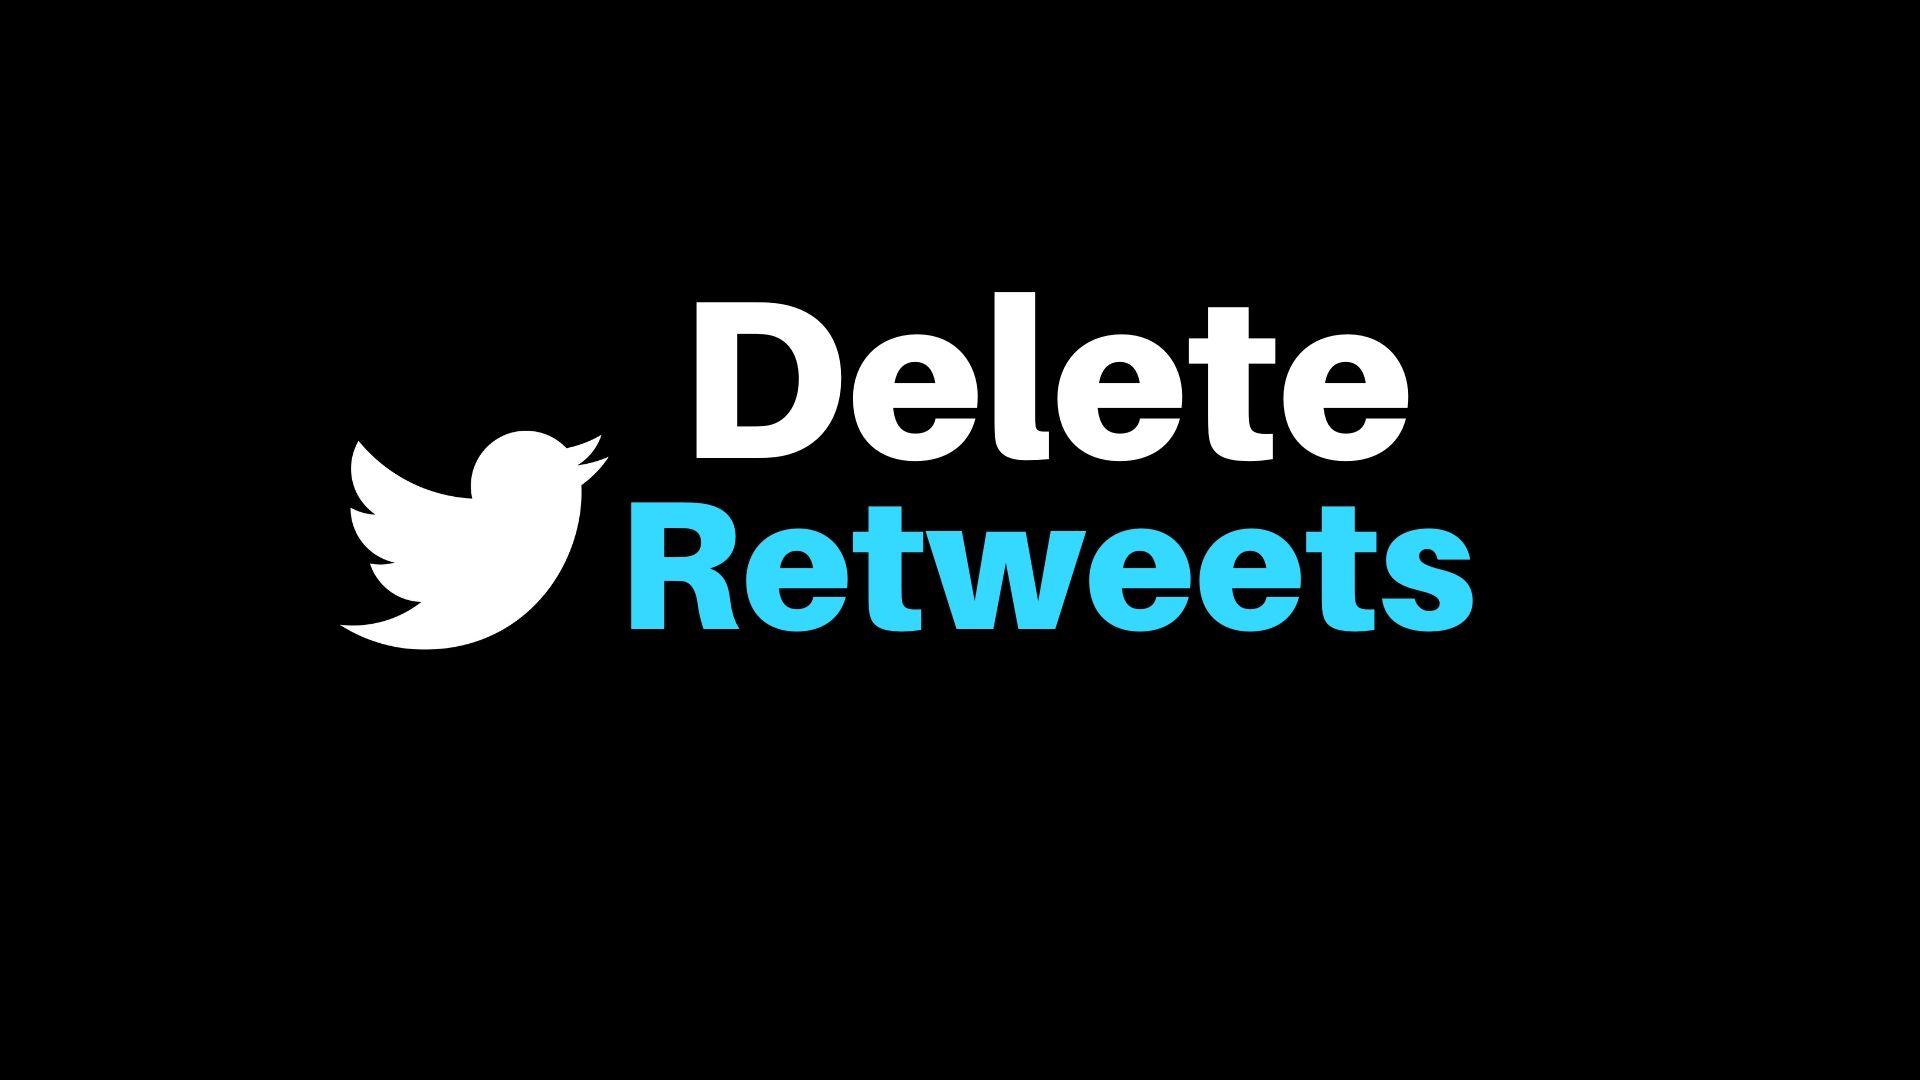 Delete Retweets